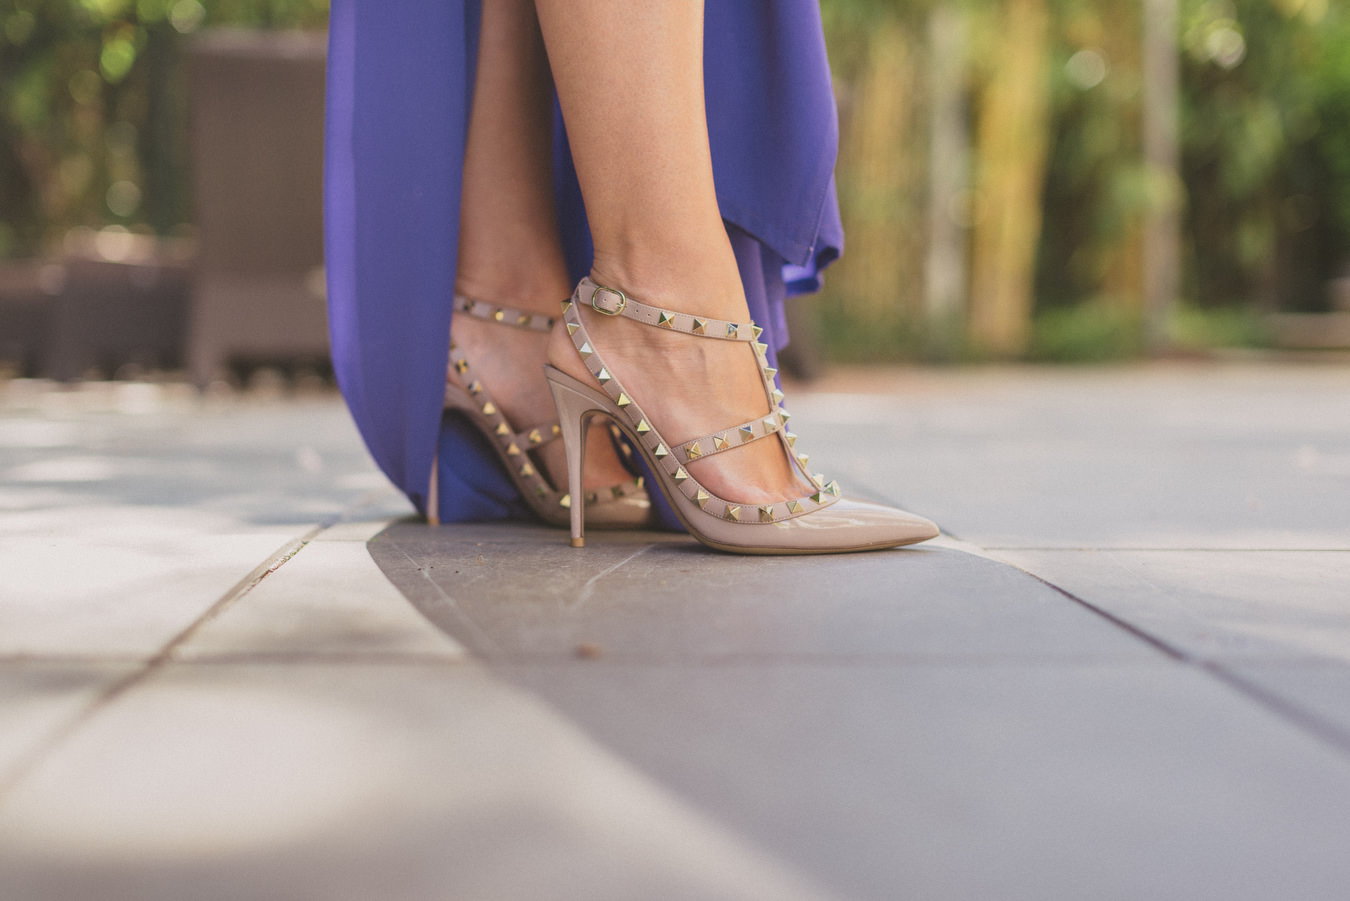 calista-one-lista-de-bodas-online-blog-de-bodas-bossanova-looks-invitadas-biombo-4